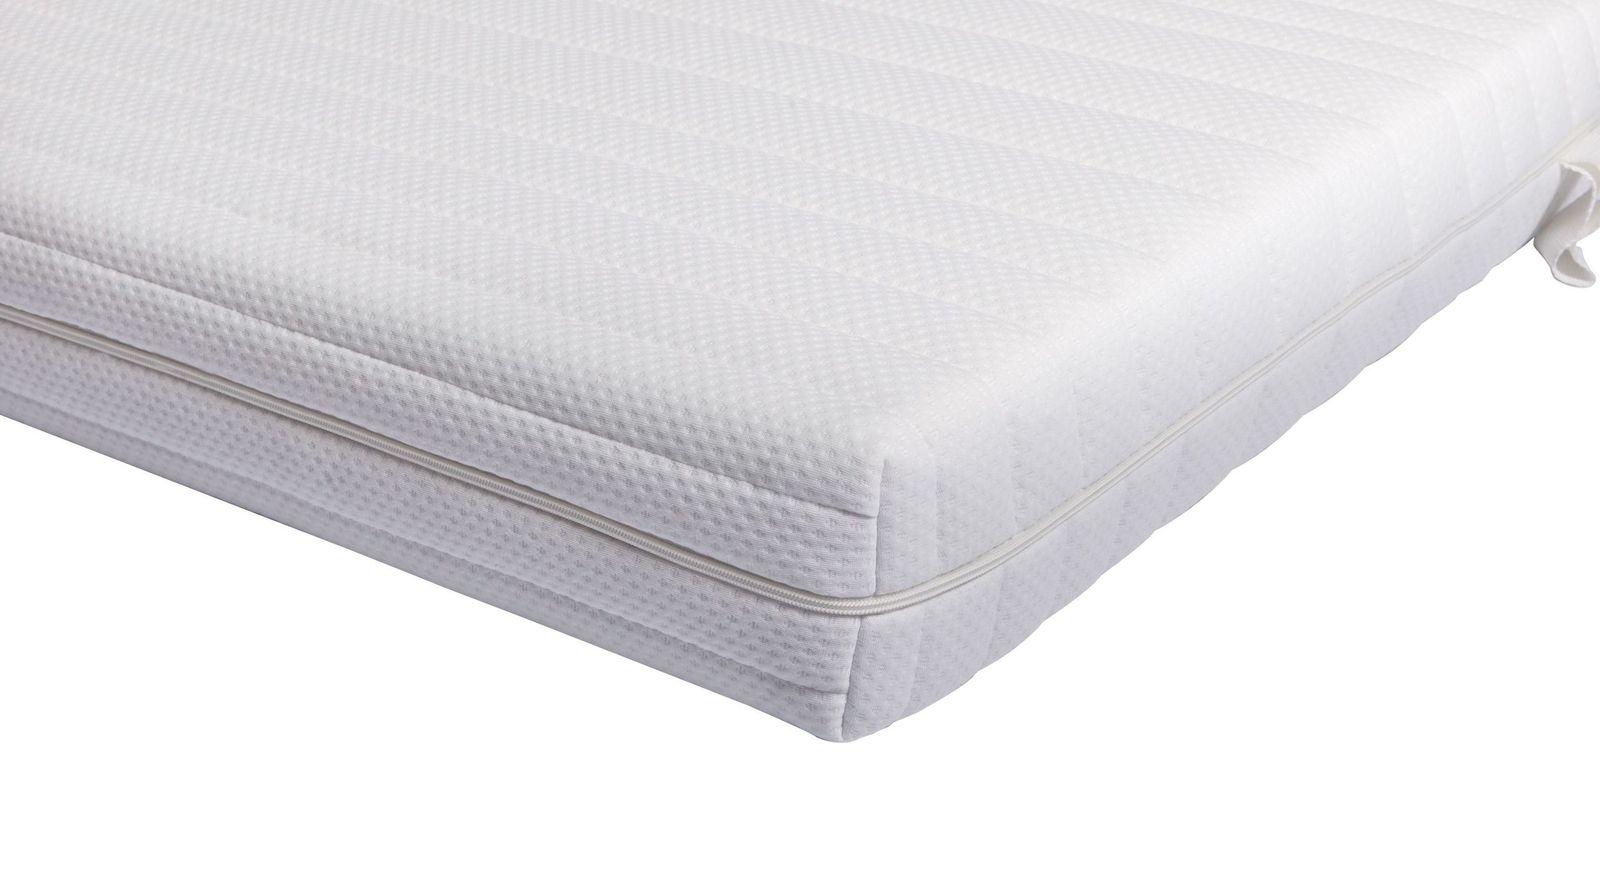 matratzen 100x200 test elegant polar matratze greenfirst. Black Bedroom Furniture Sets. Home Design Ideas